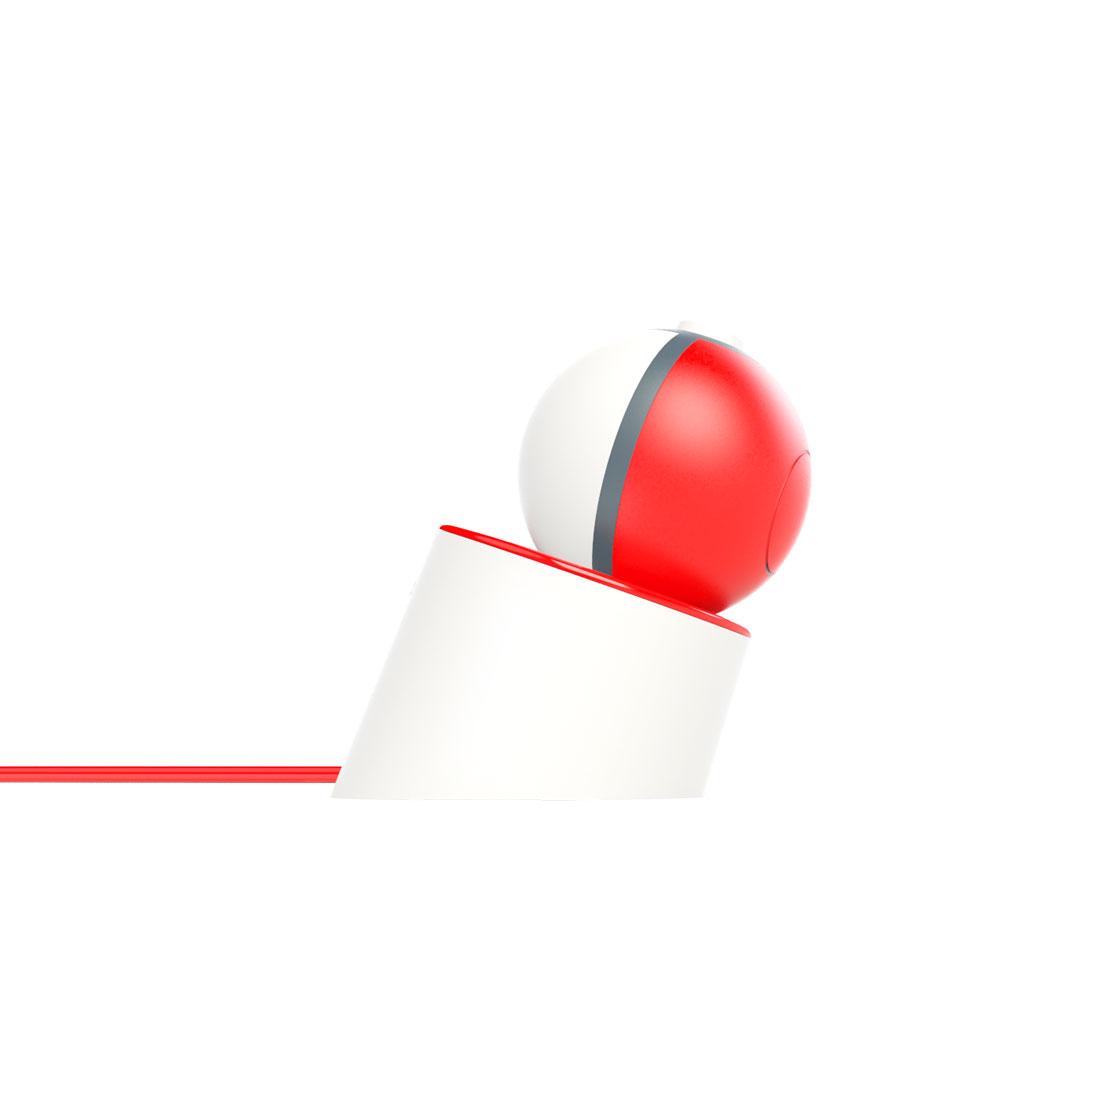 pokeball-charger-w-ball-profile-left-1100x1100